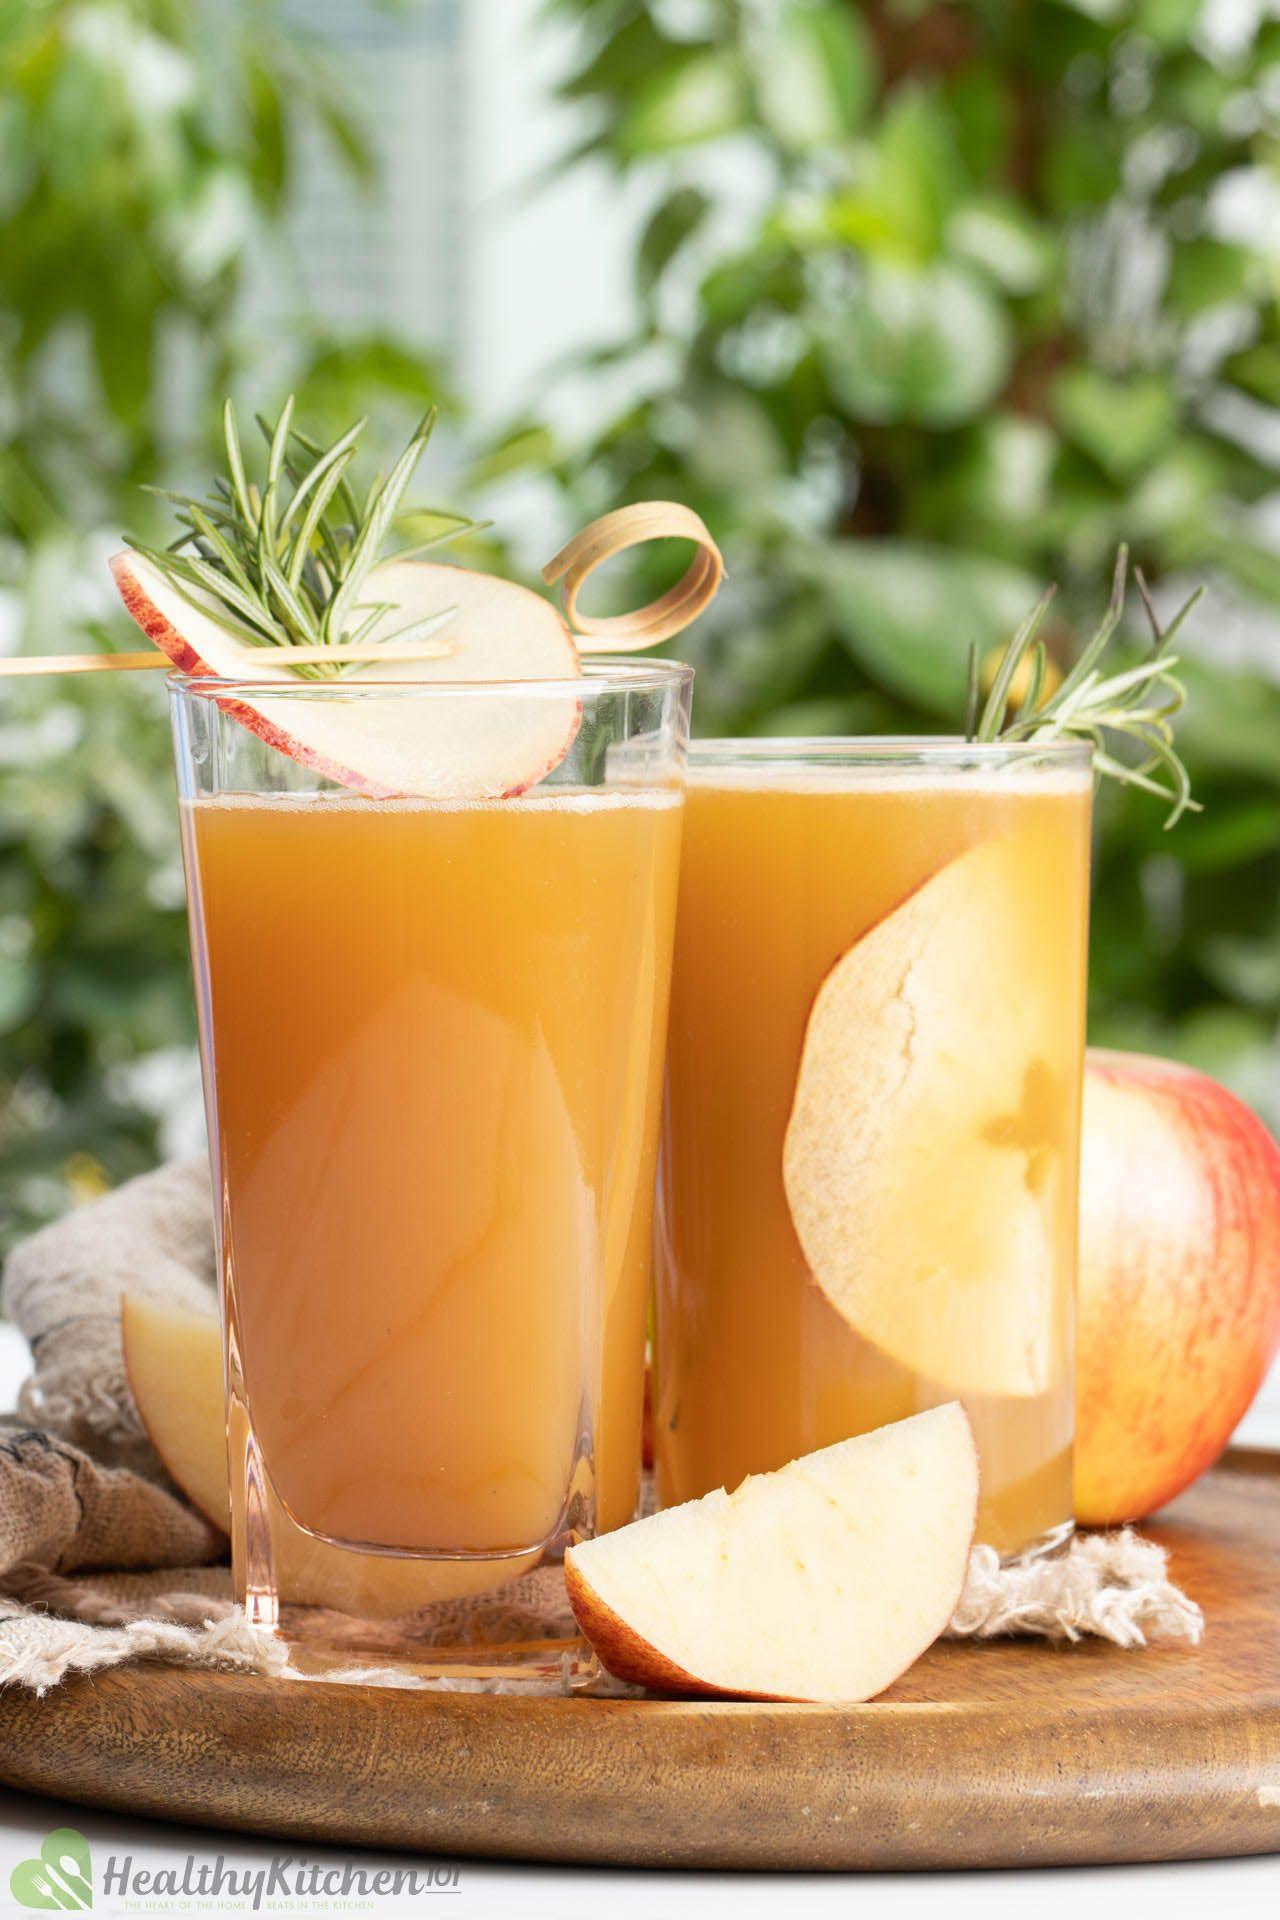 sugar-free apple juice recipe